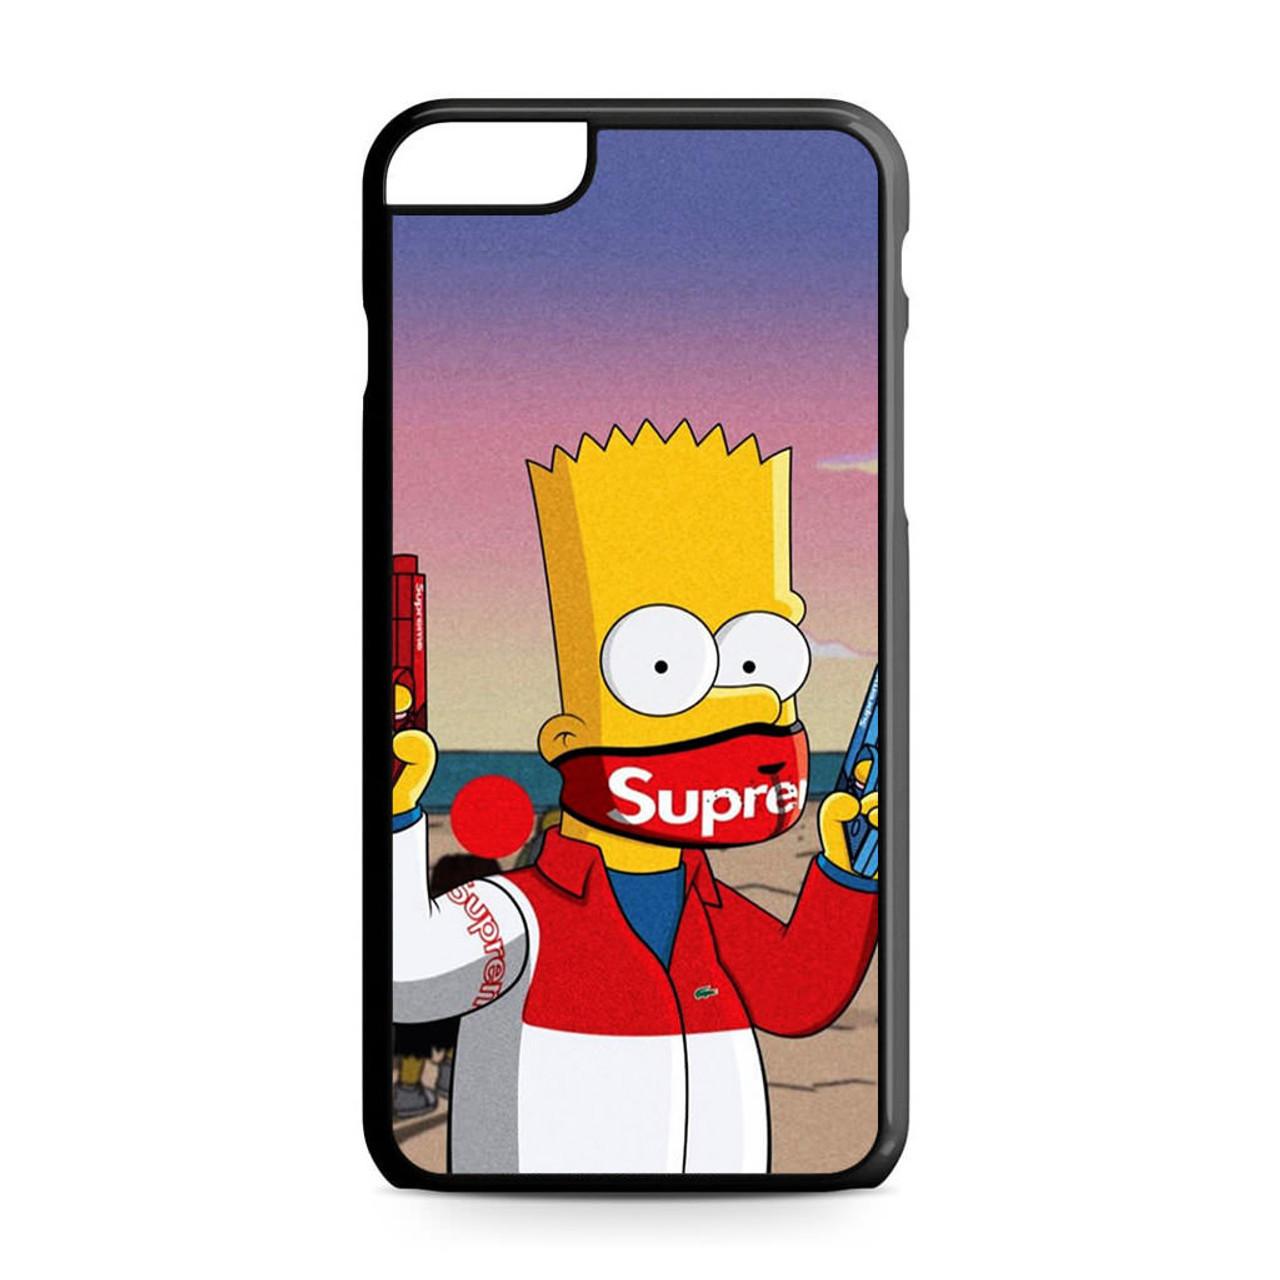 newest 3f01f 4572a Bart Supreme iPhone 6 Plus/6S Plus Case